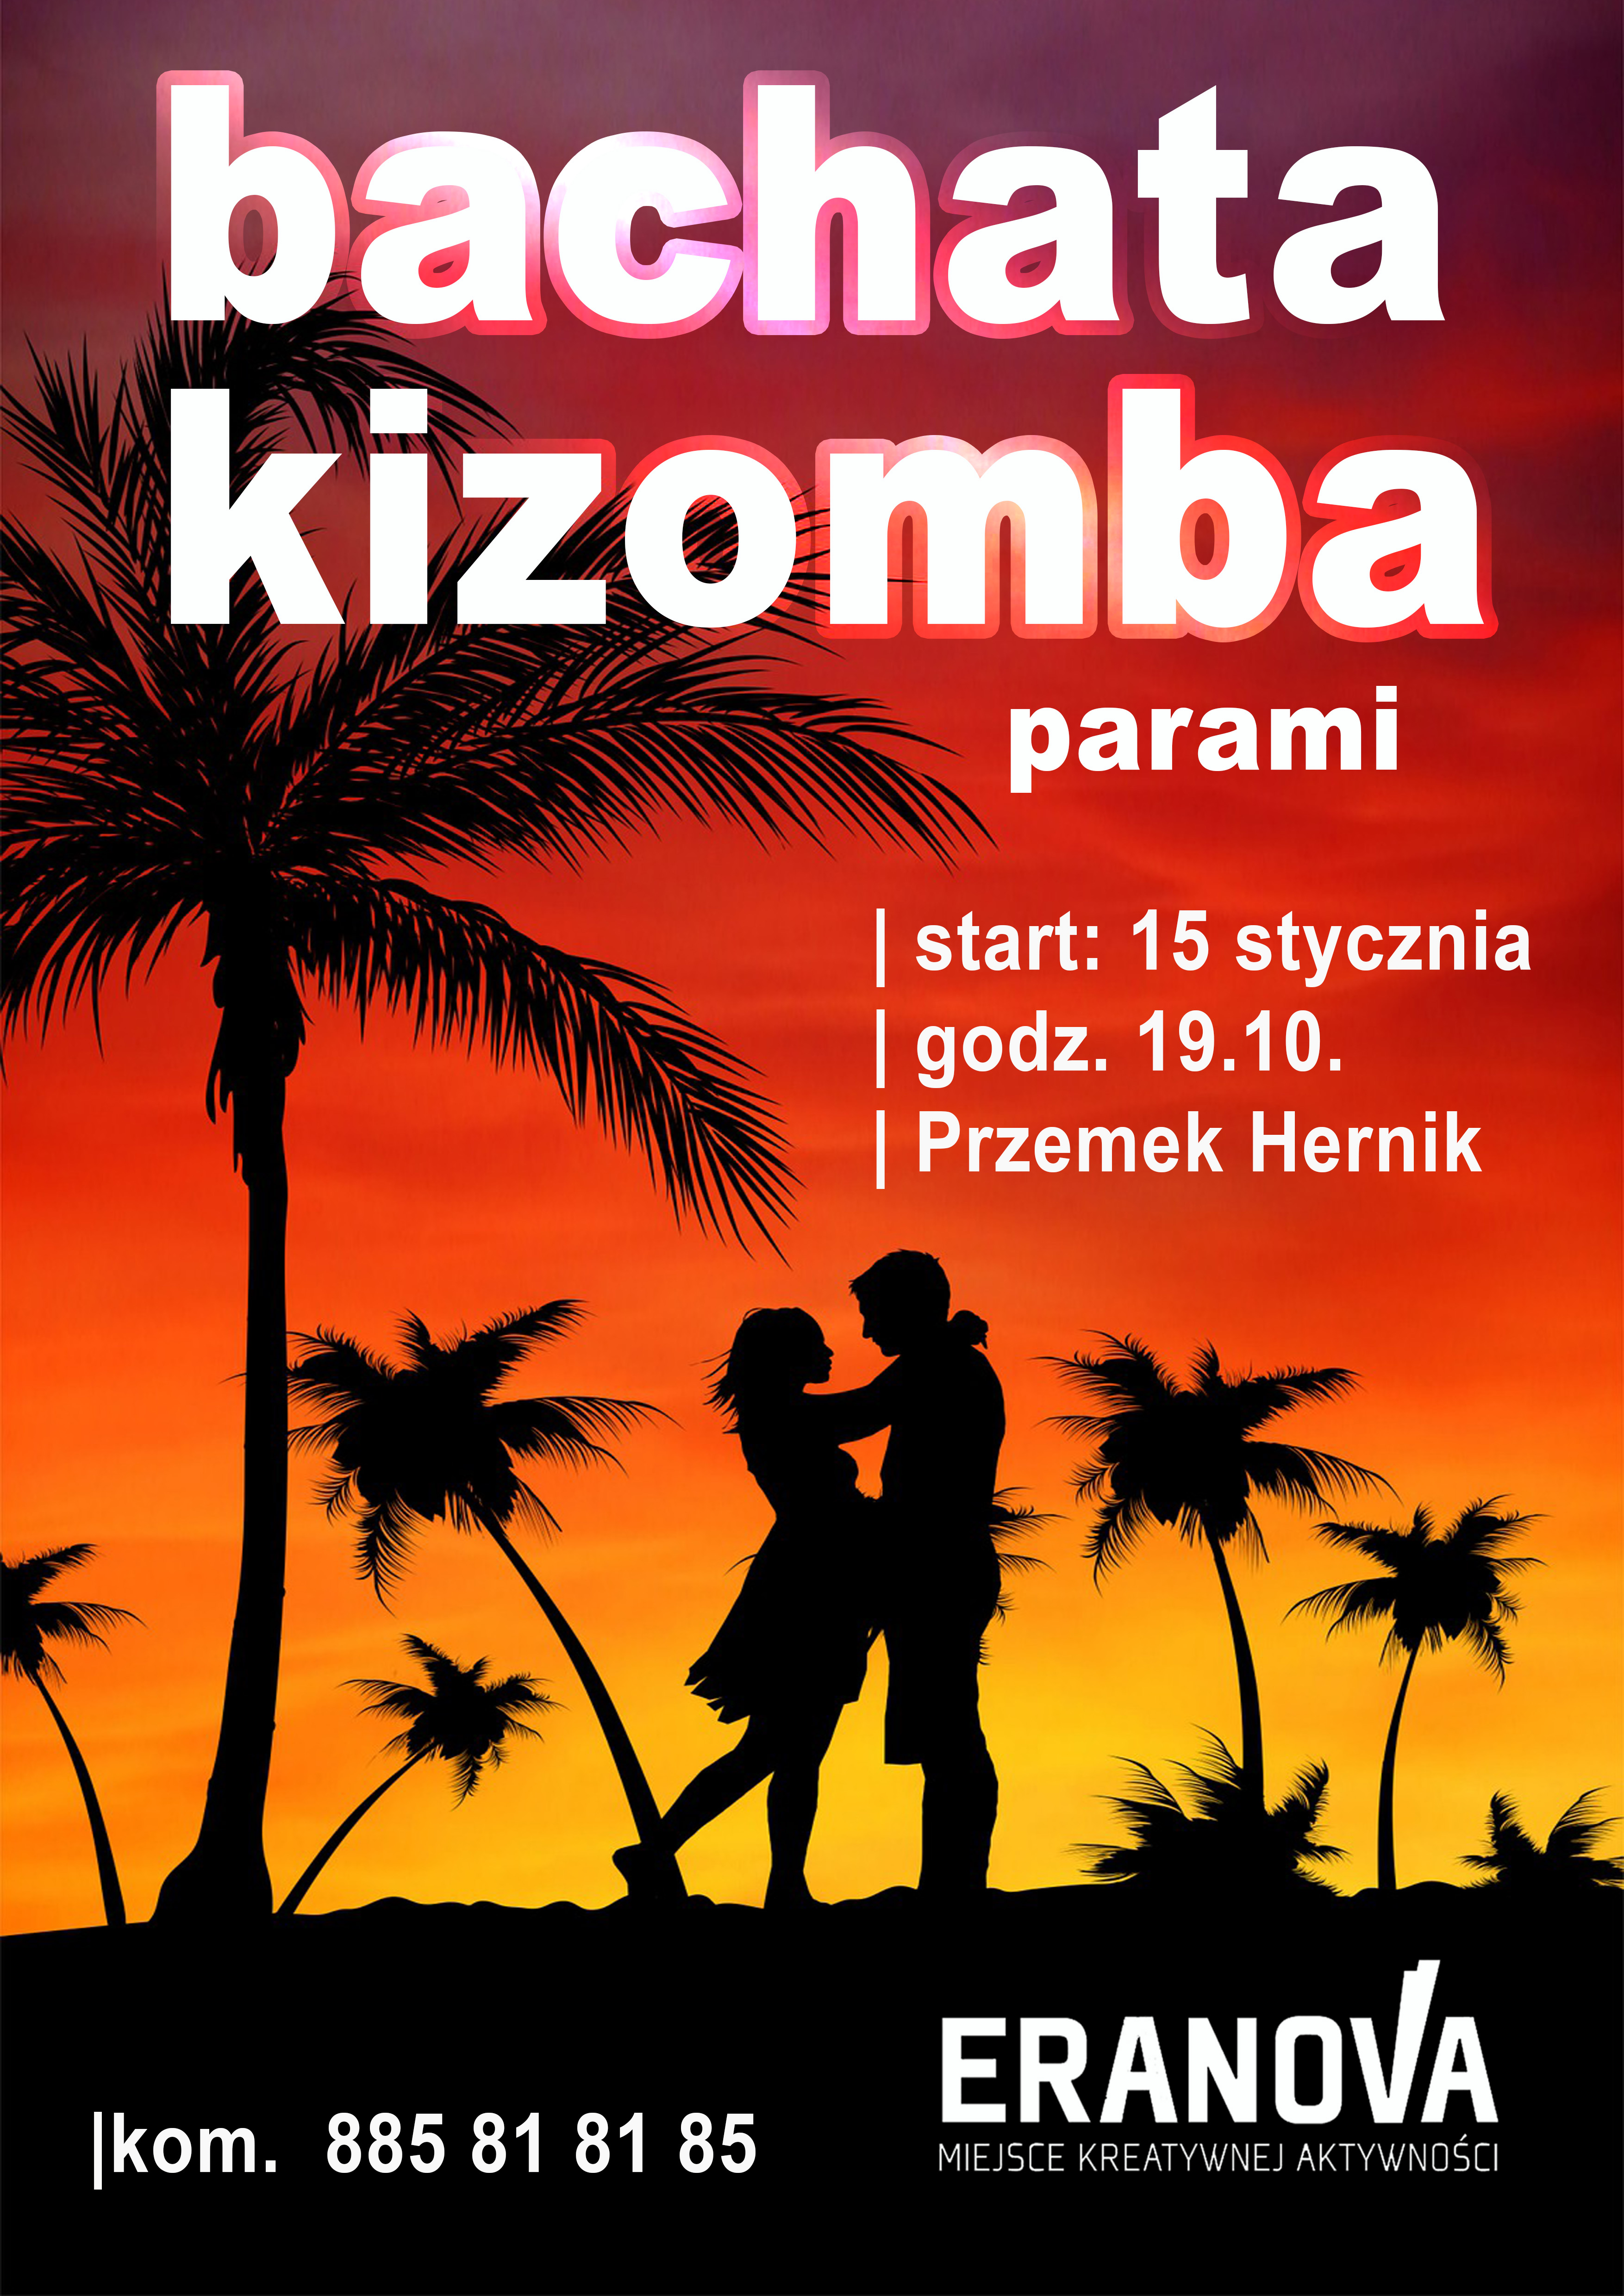 http://m.eranova.pl/2018/11/orig/kizomba-bachata-2853.jpg